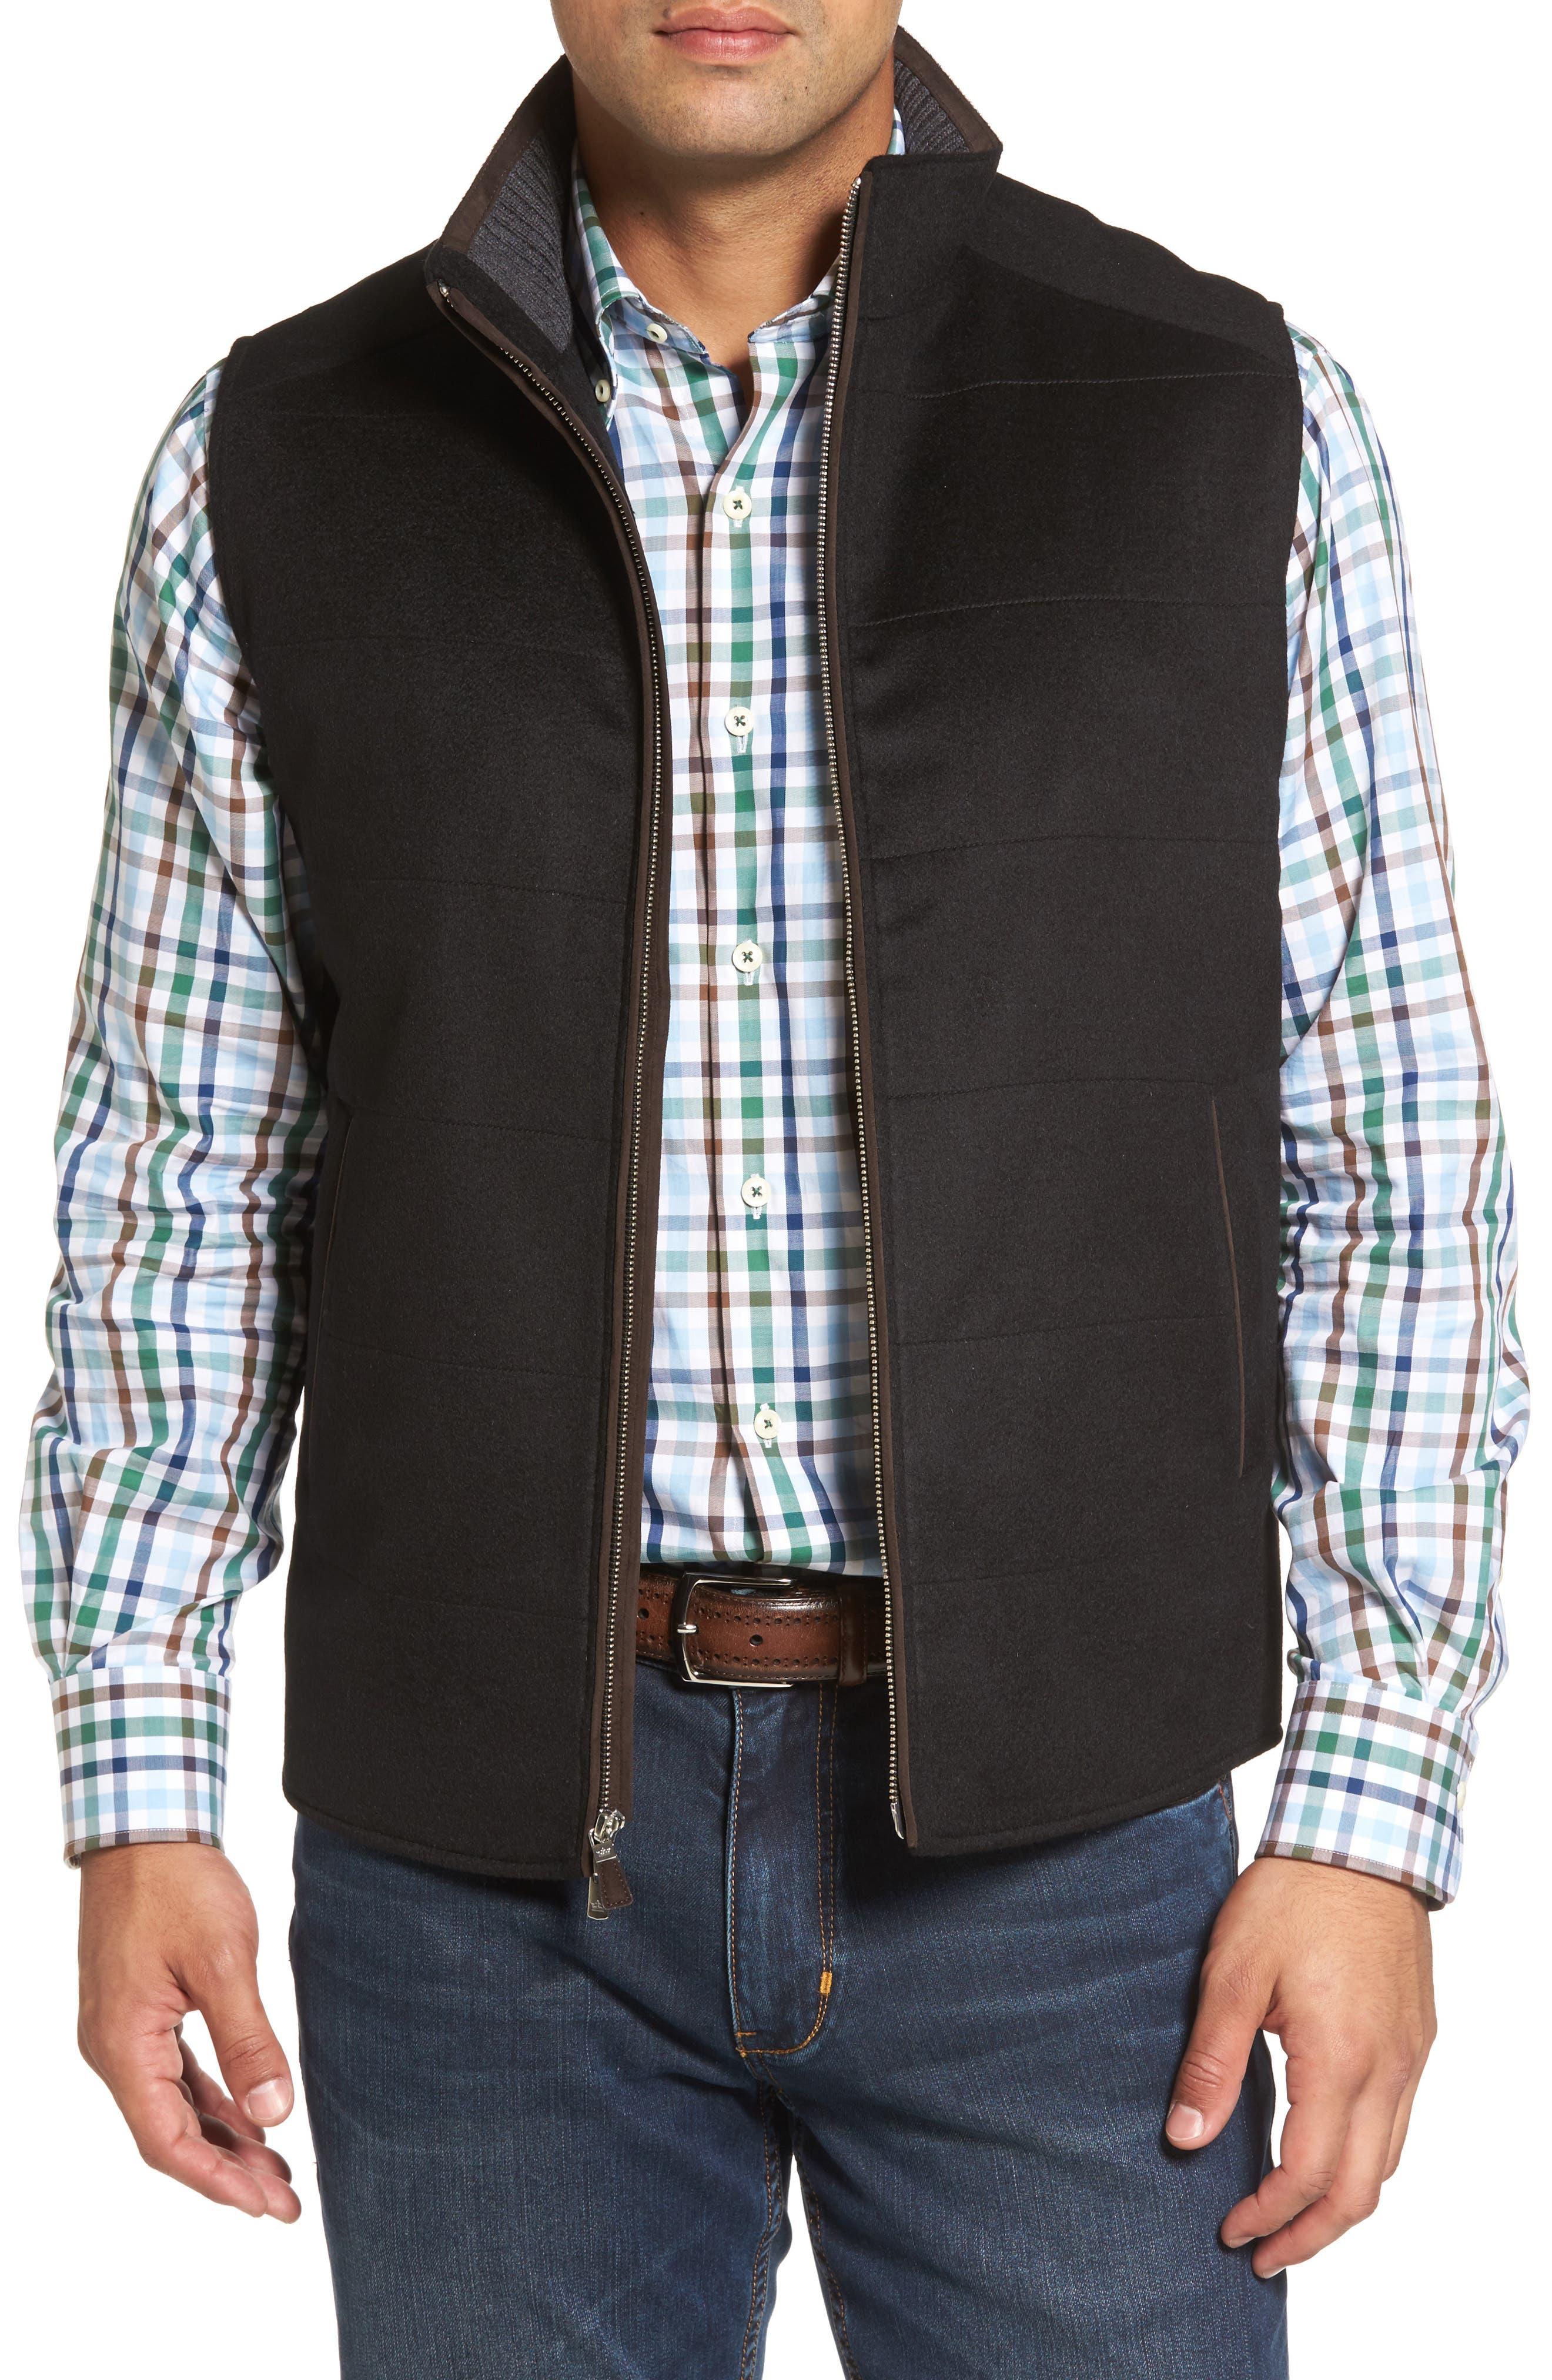 Peter Millar Crown Darien Wool & Cashmere Vest